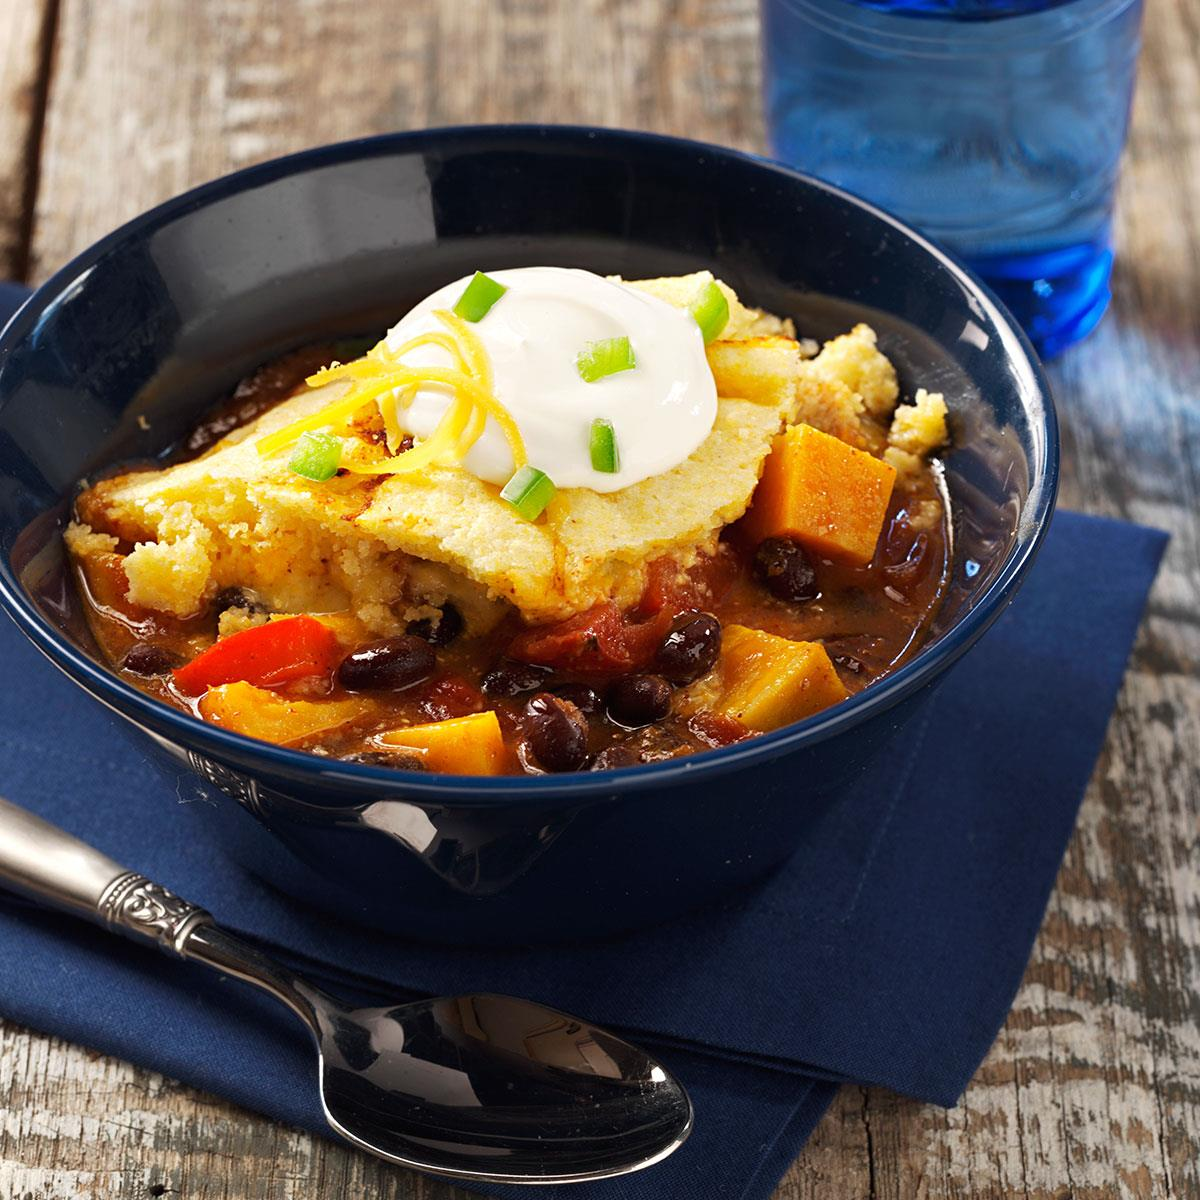 10 Healthy Ways To Cook With Potatoes: Sweet Potato Chili Bake Recipe